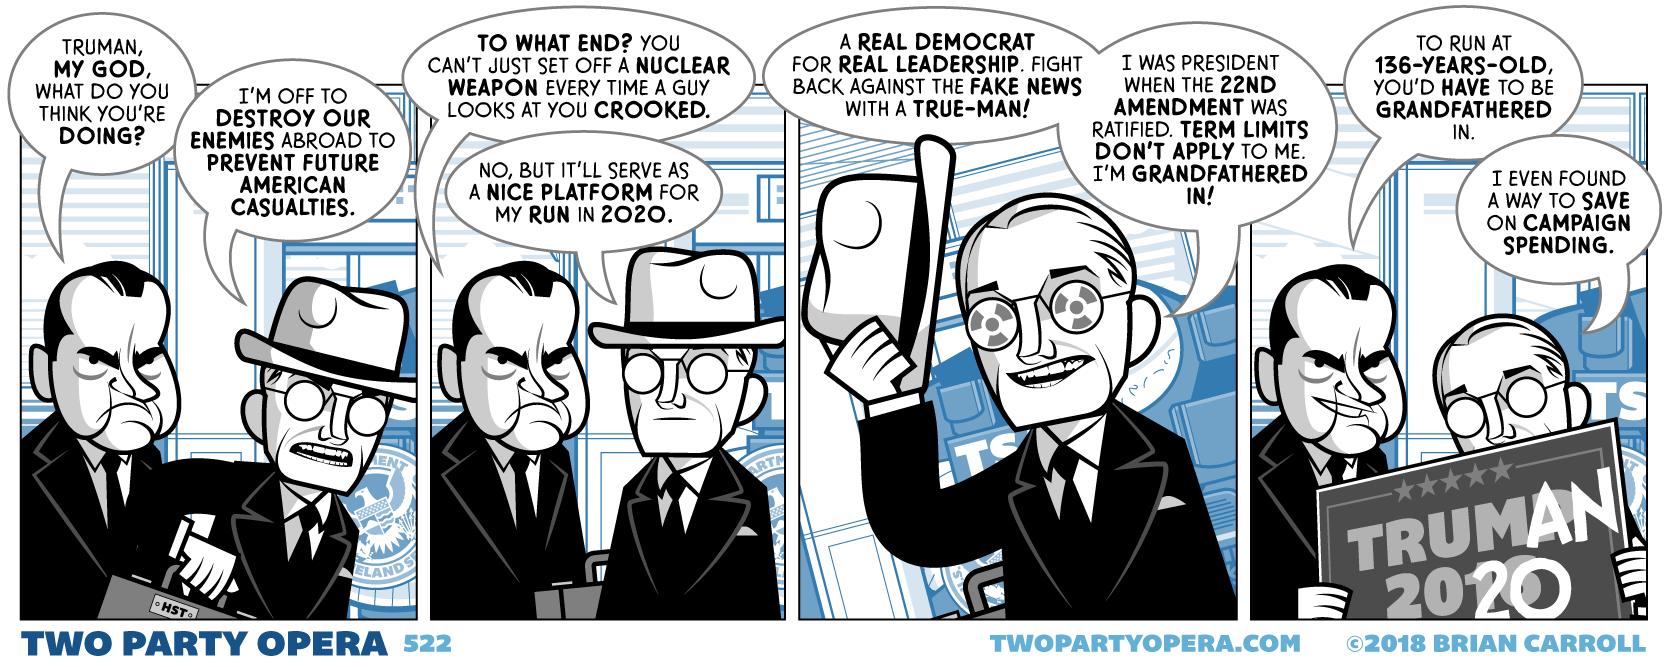 Truman 2020